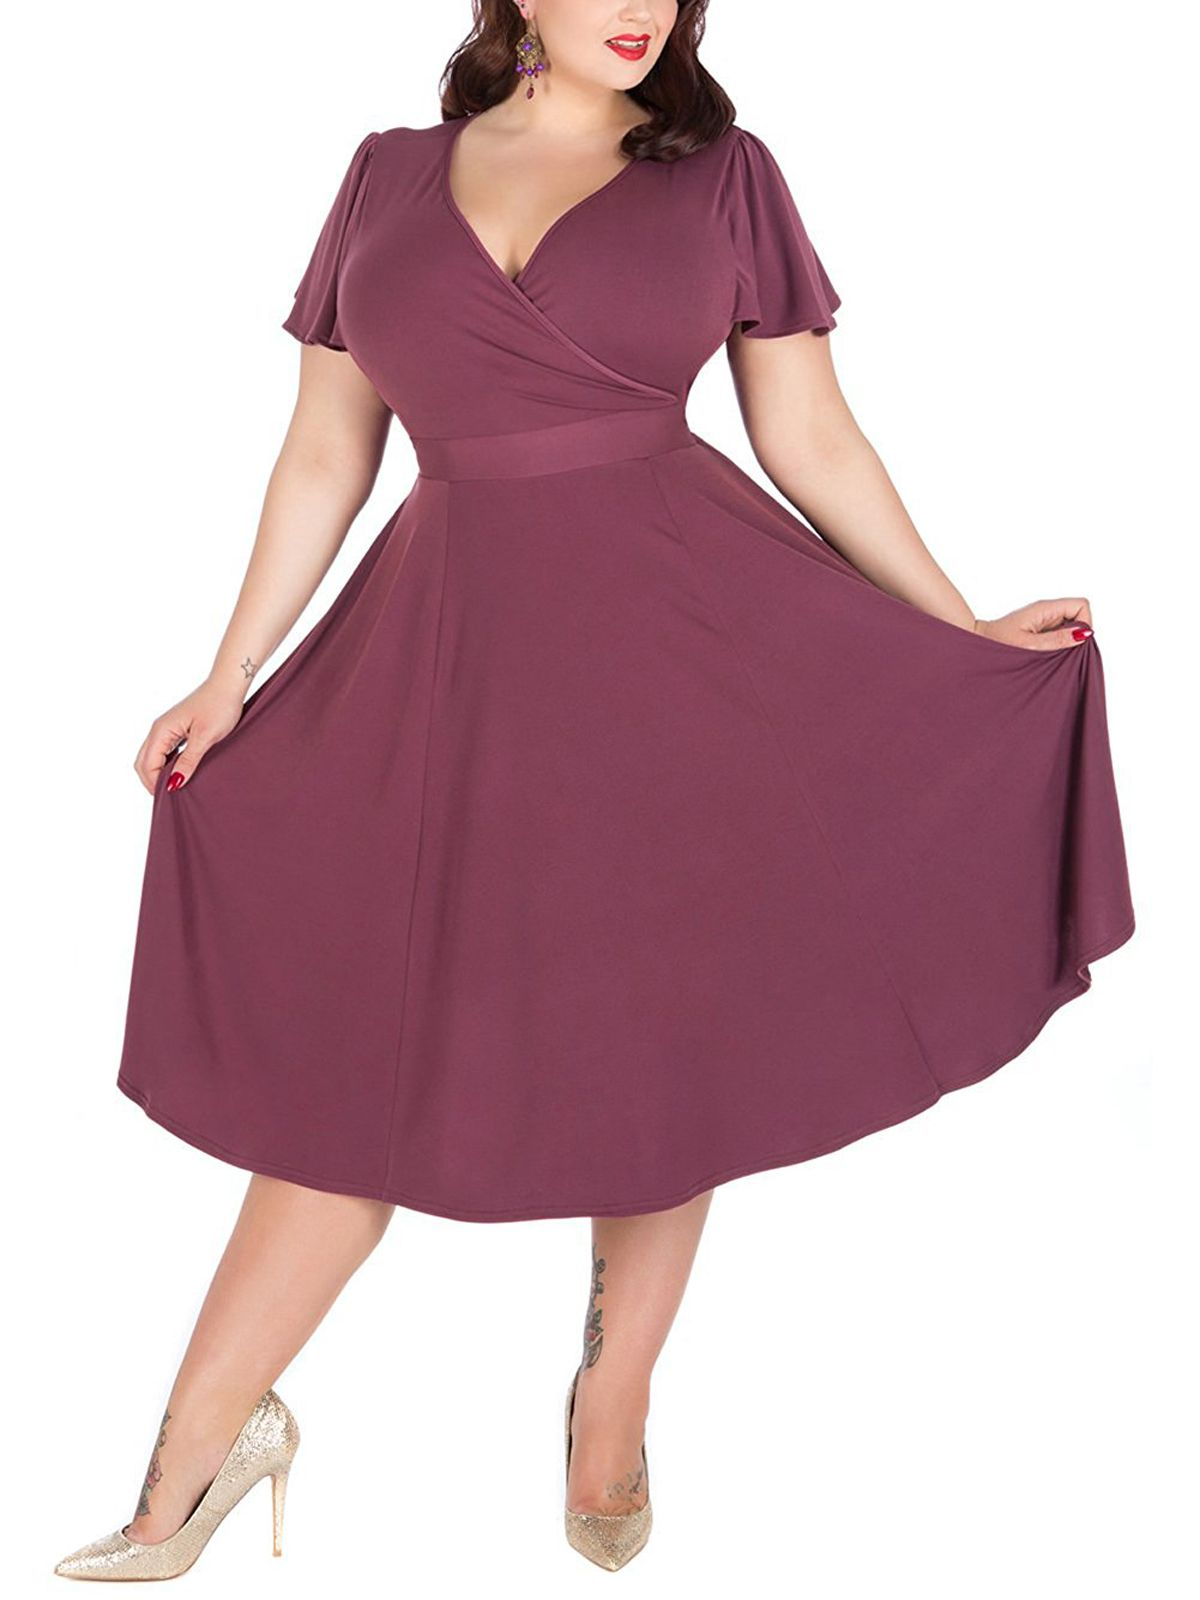 Women\'s V-neckline Stretchy Casual Midi Plus Size Bridesmaid Dress ...